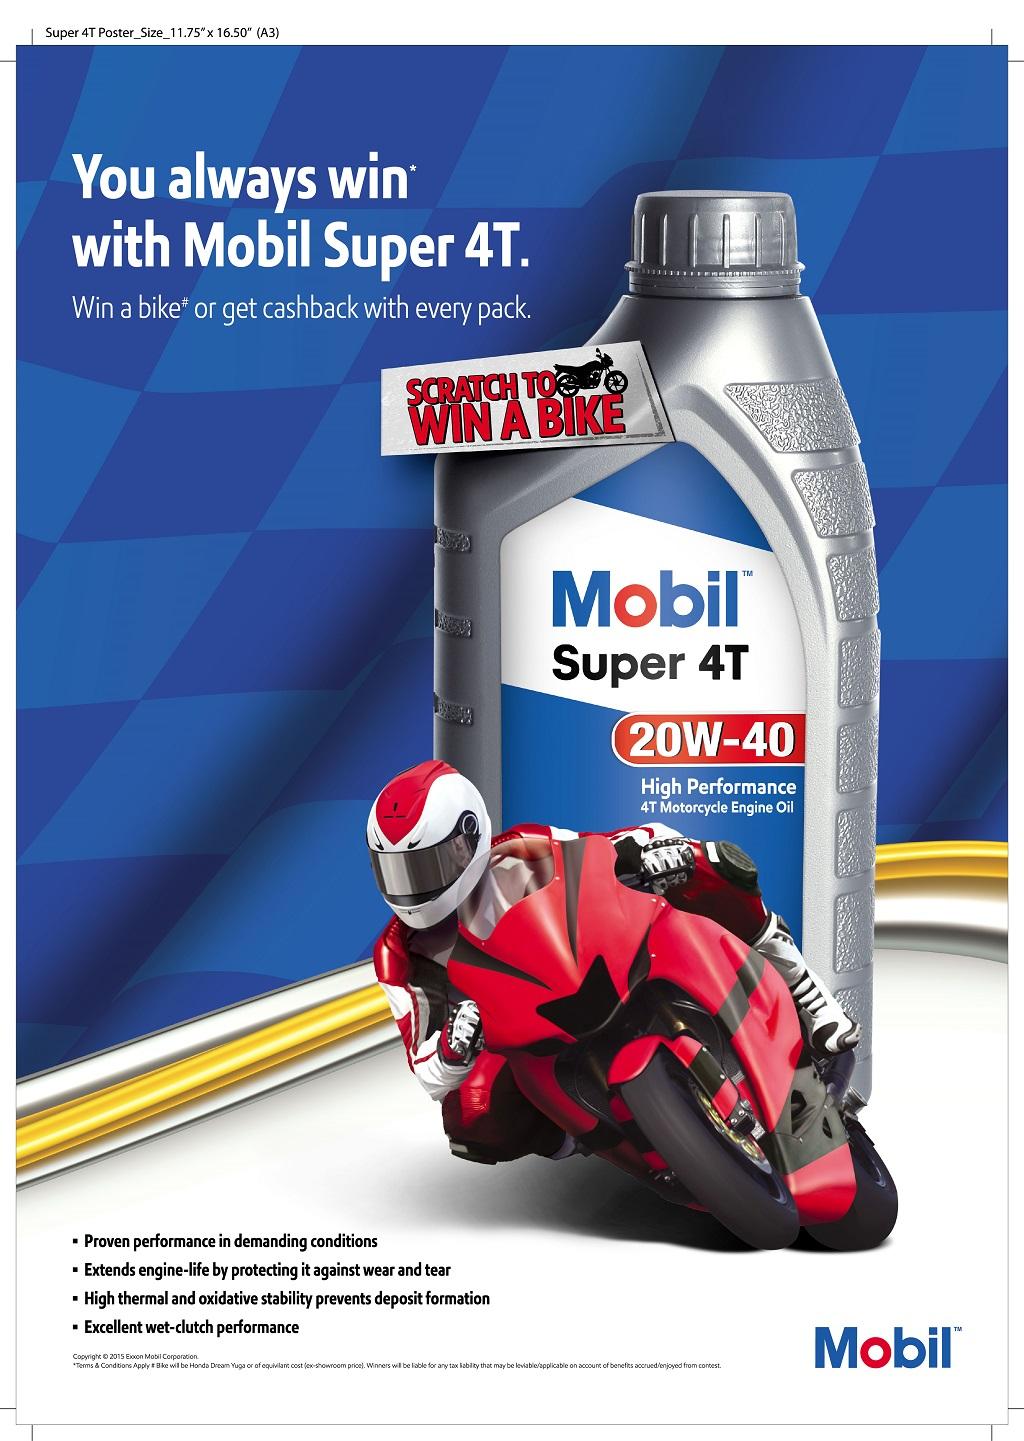 Exxon mobil photo contest